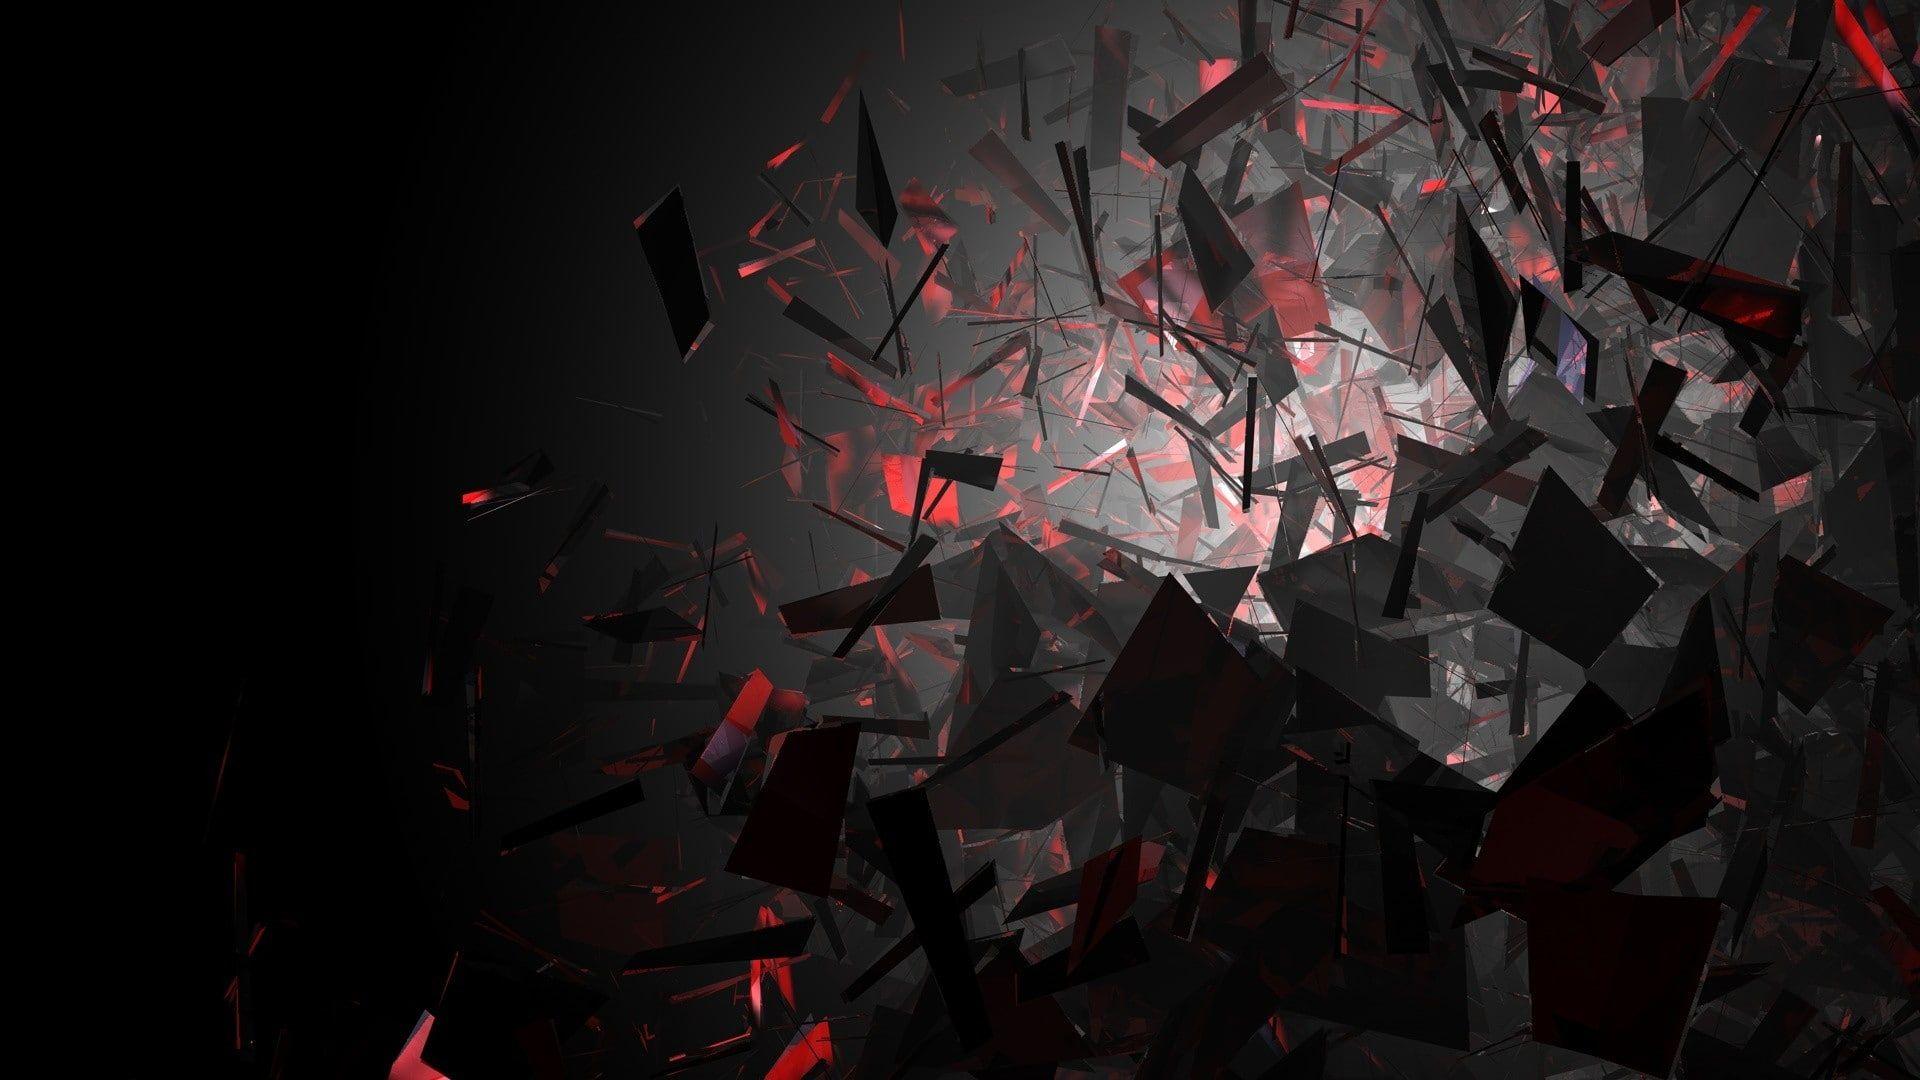 Abstract Wallpaper Digital Art Shapes 3d Abstract Wallpaper Backgrounds Abstract Wallpaper Abstract Art Wallpaper